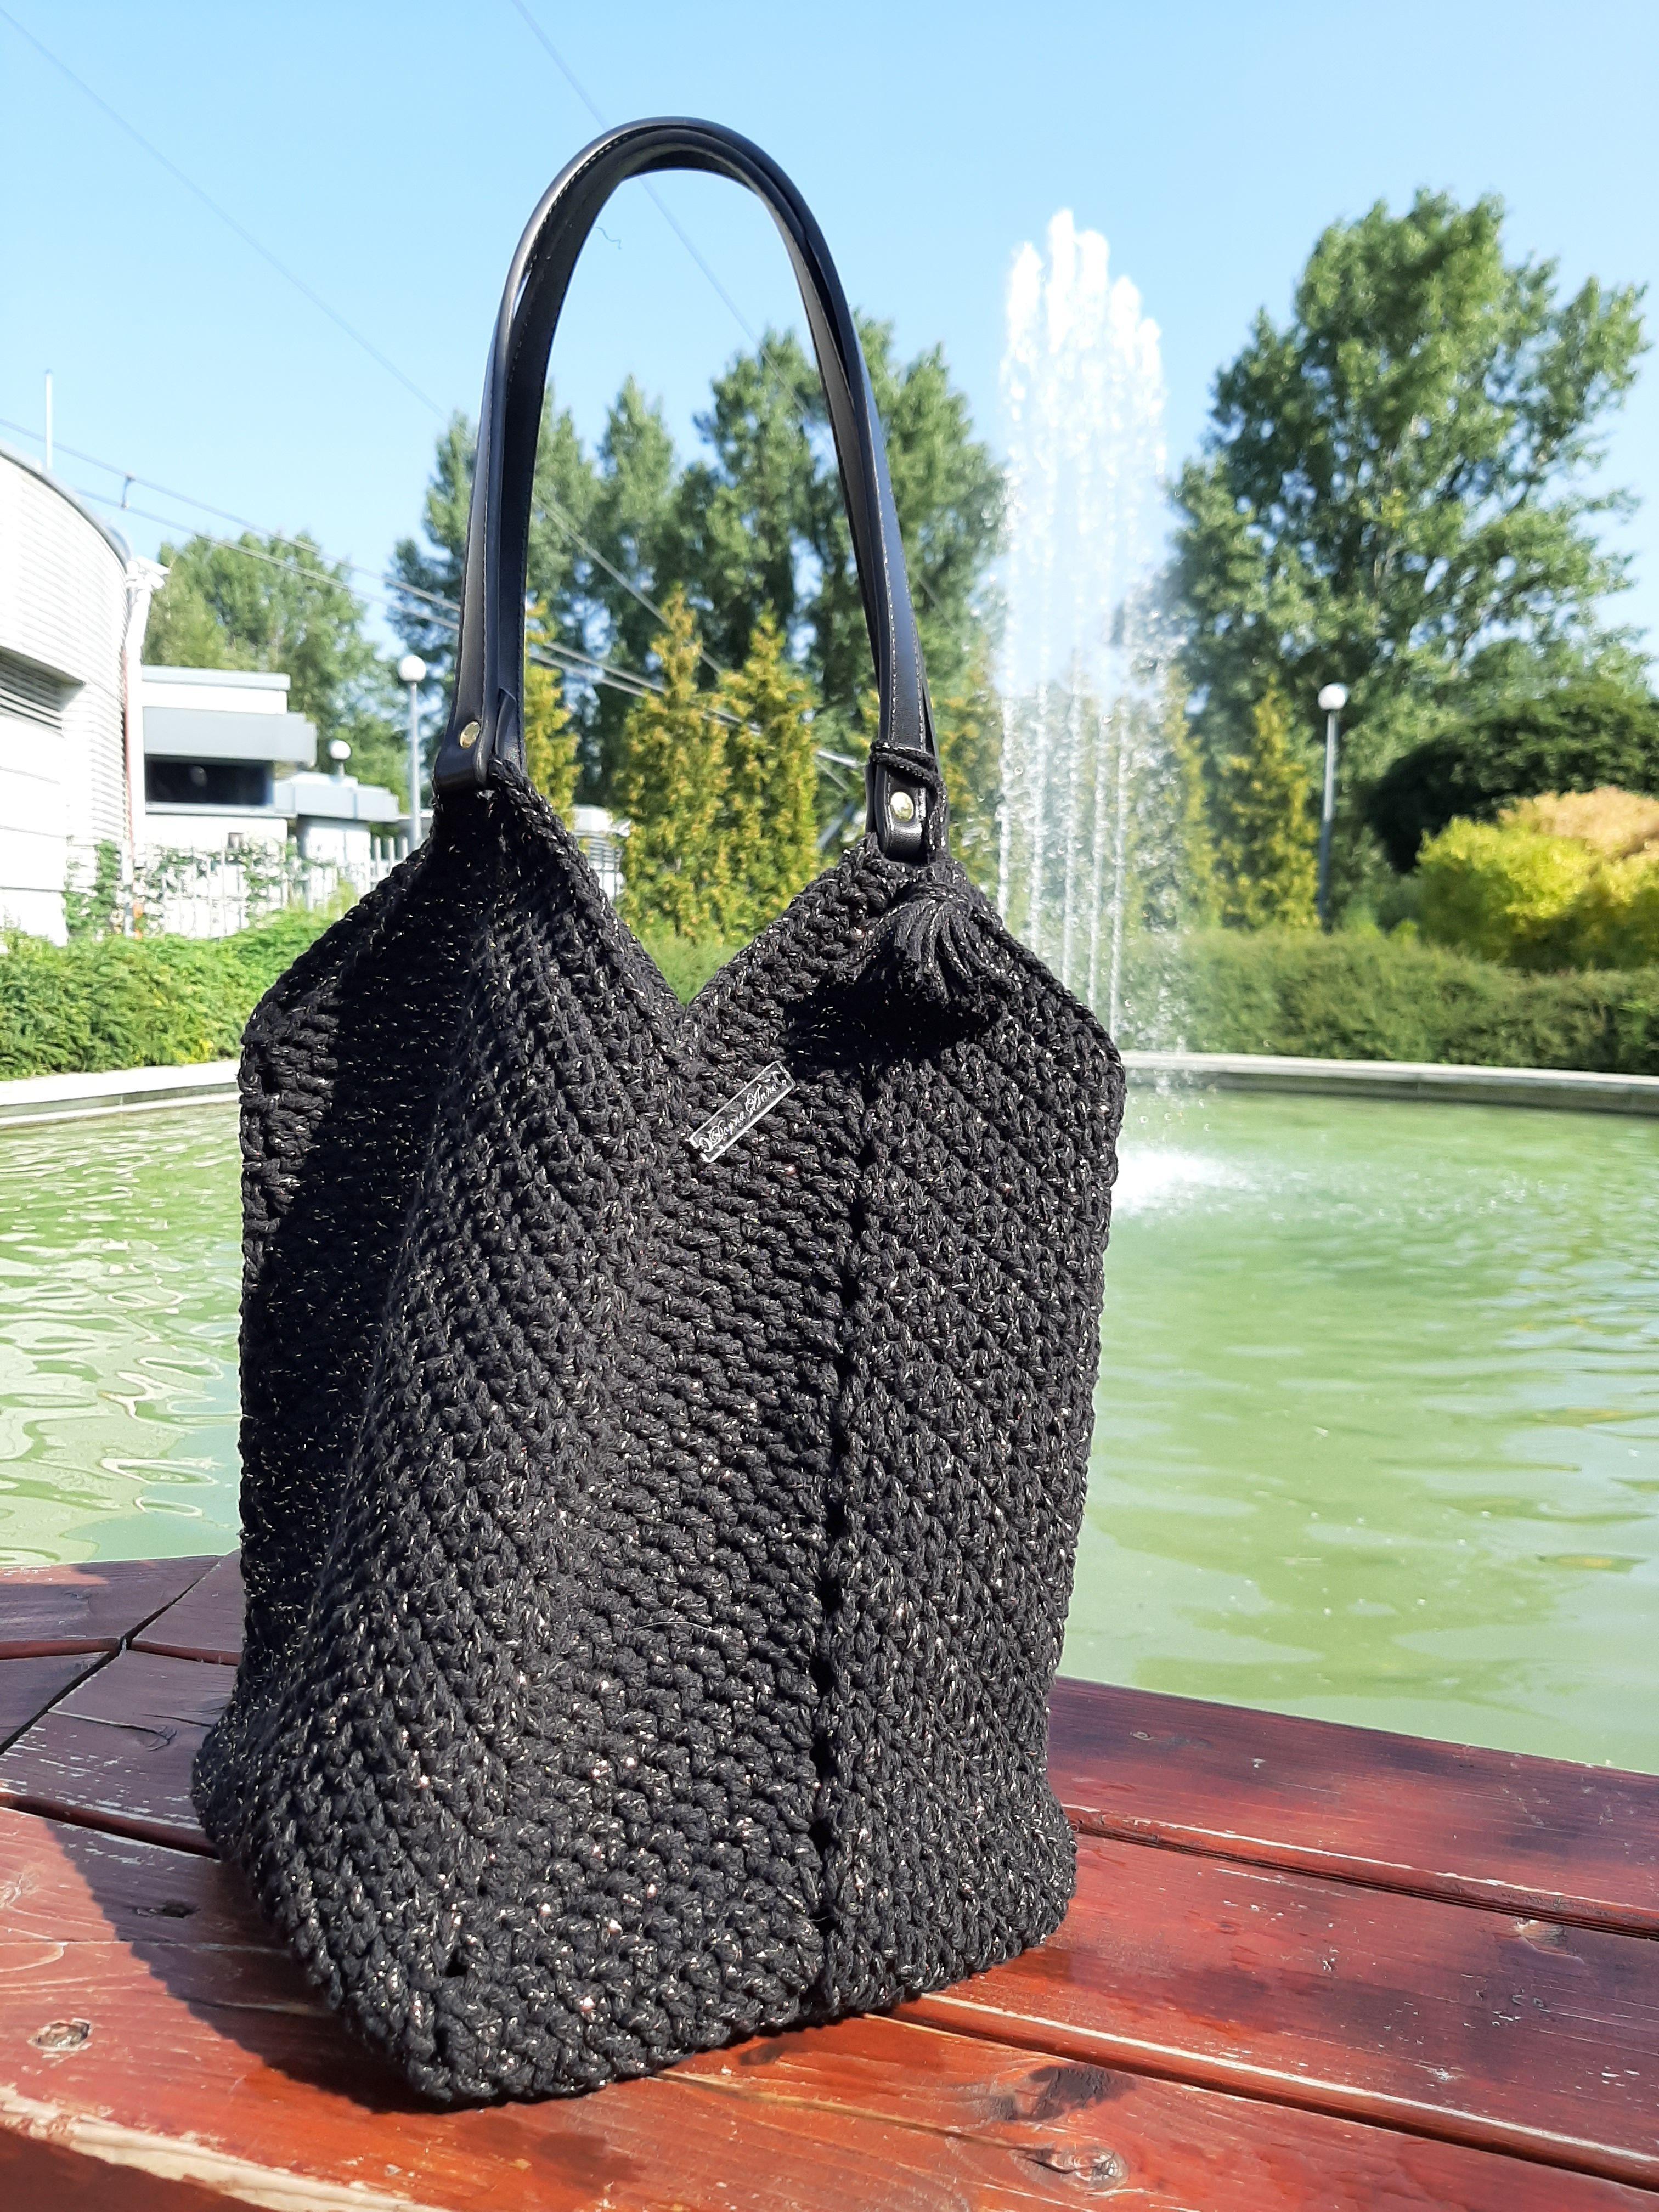 Szydelkowa Bawelniana Torba Crochet Bag Crochet Handbag Tassel